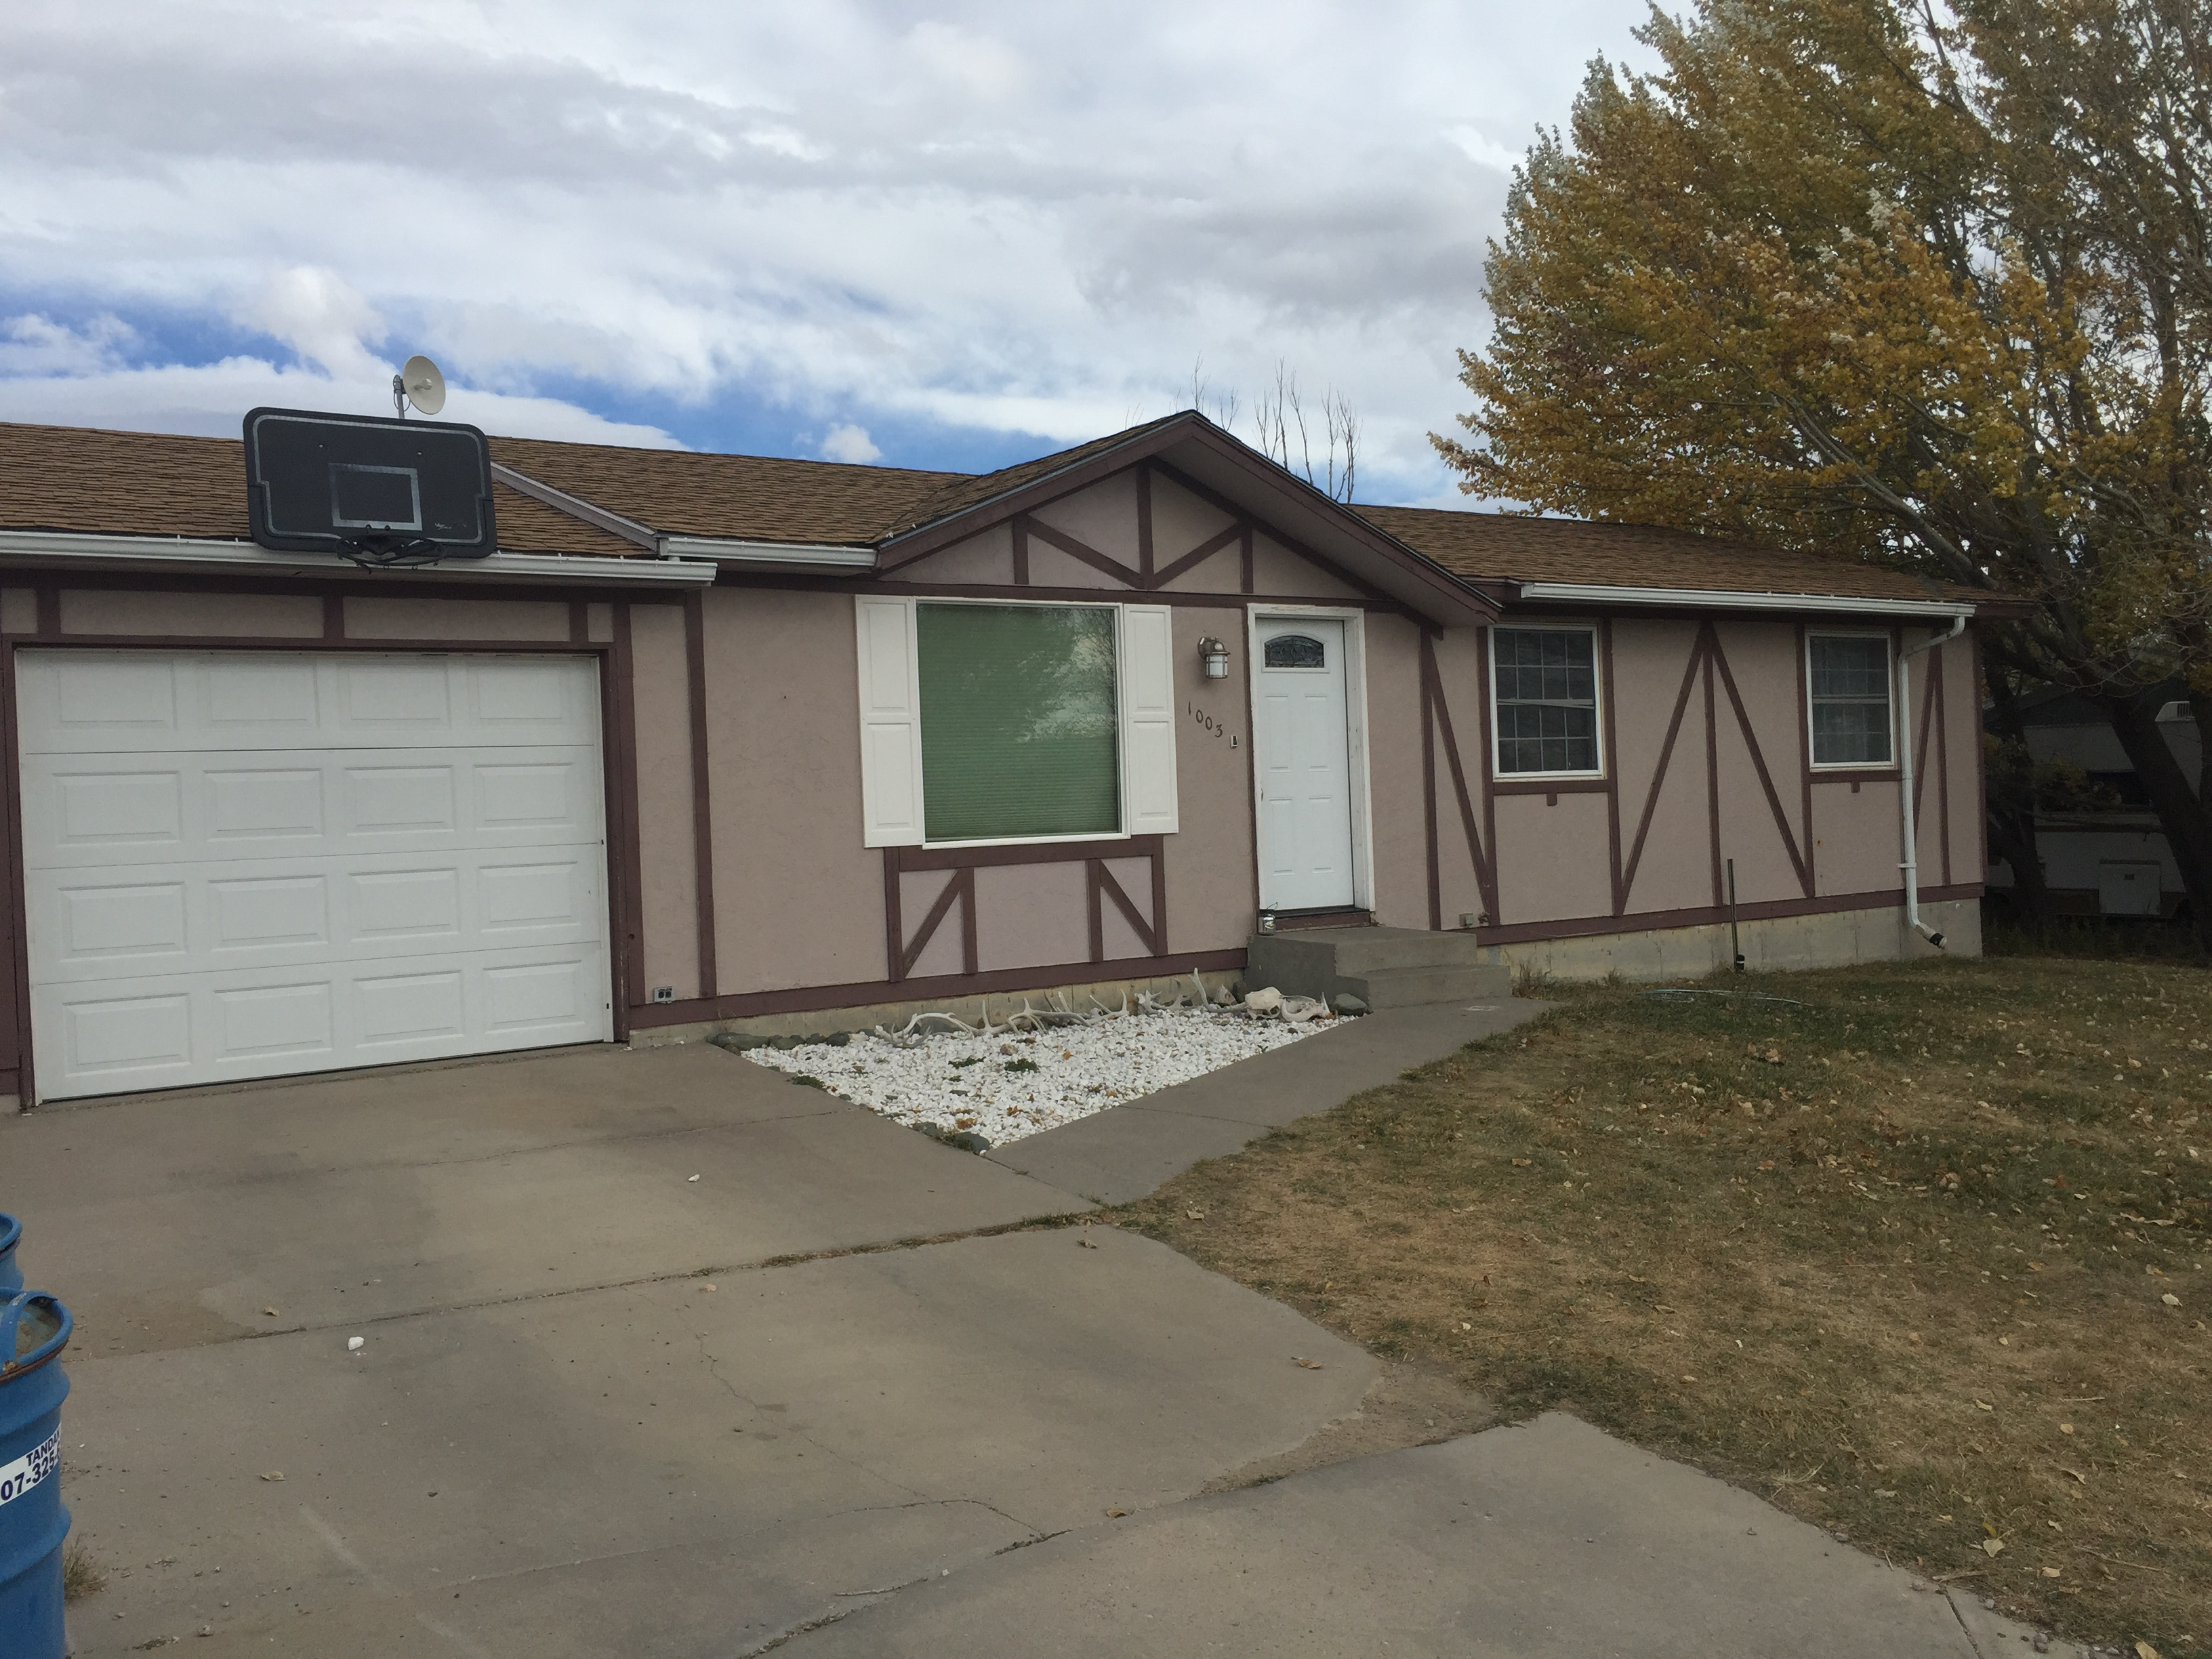 1003 Beryl Dr, Hanna, Wyoming 82327